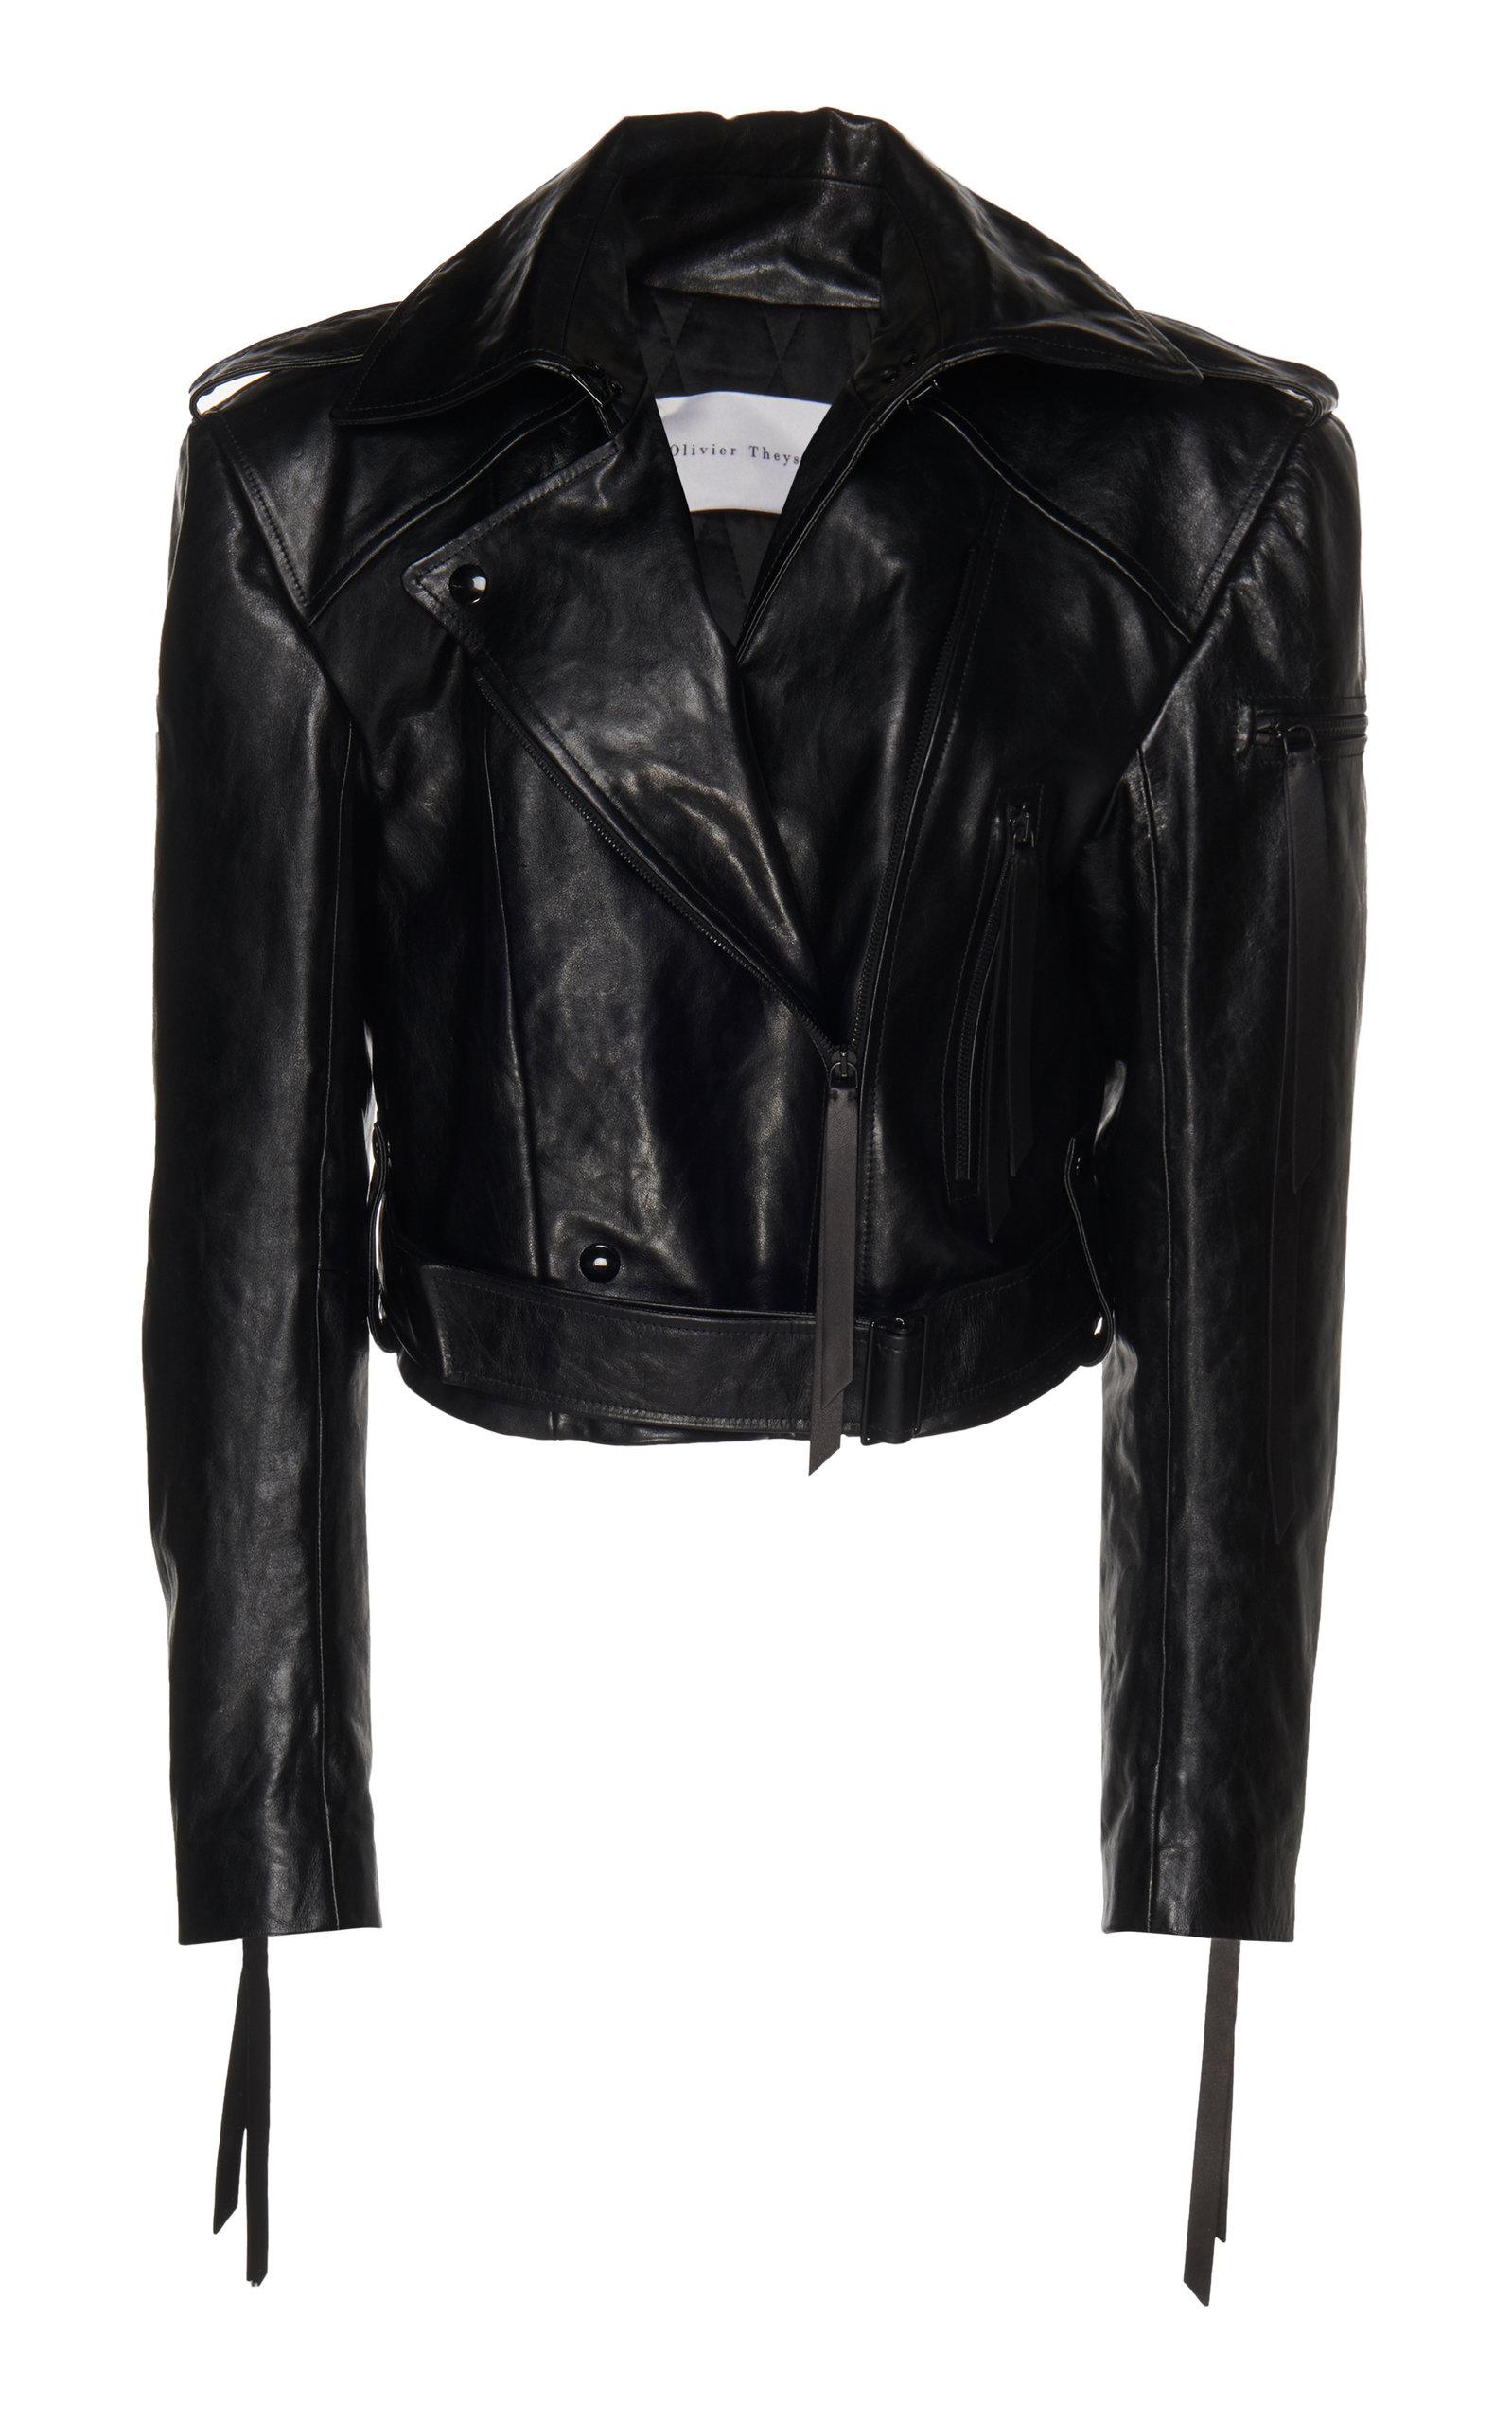 OLIVIER THEYSKENS Leather Biker Jacket in Black